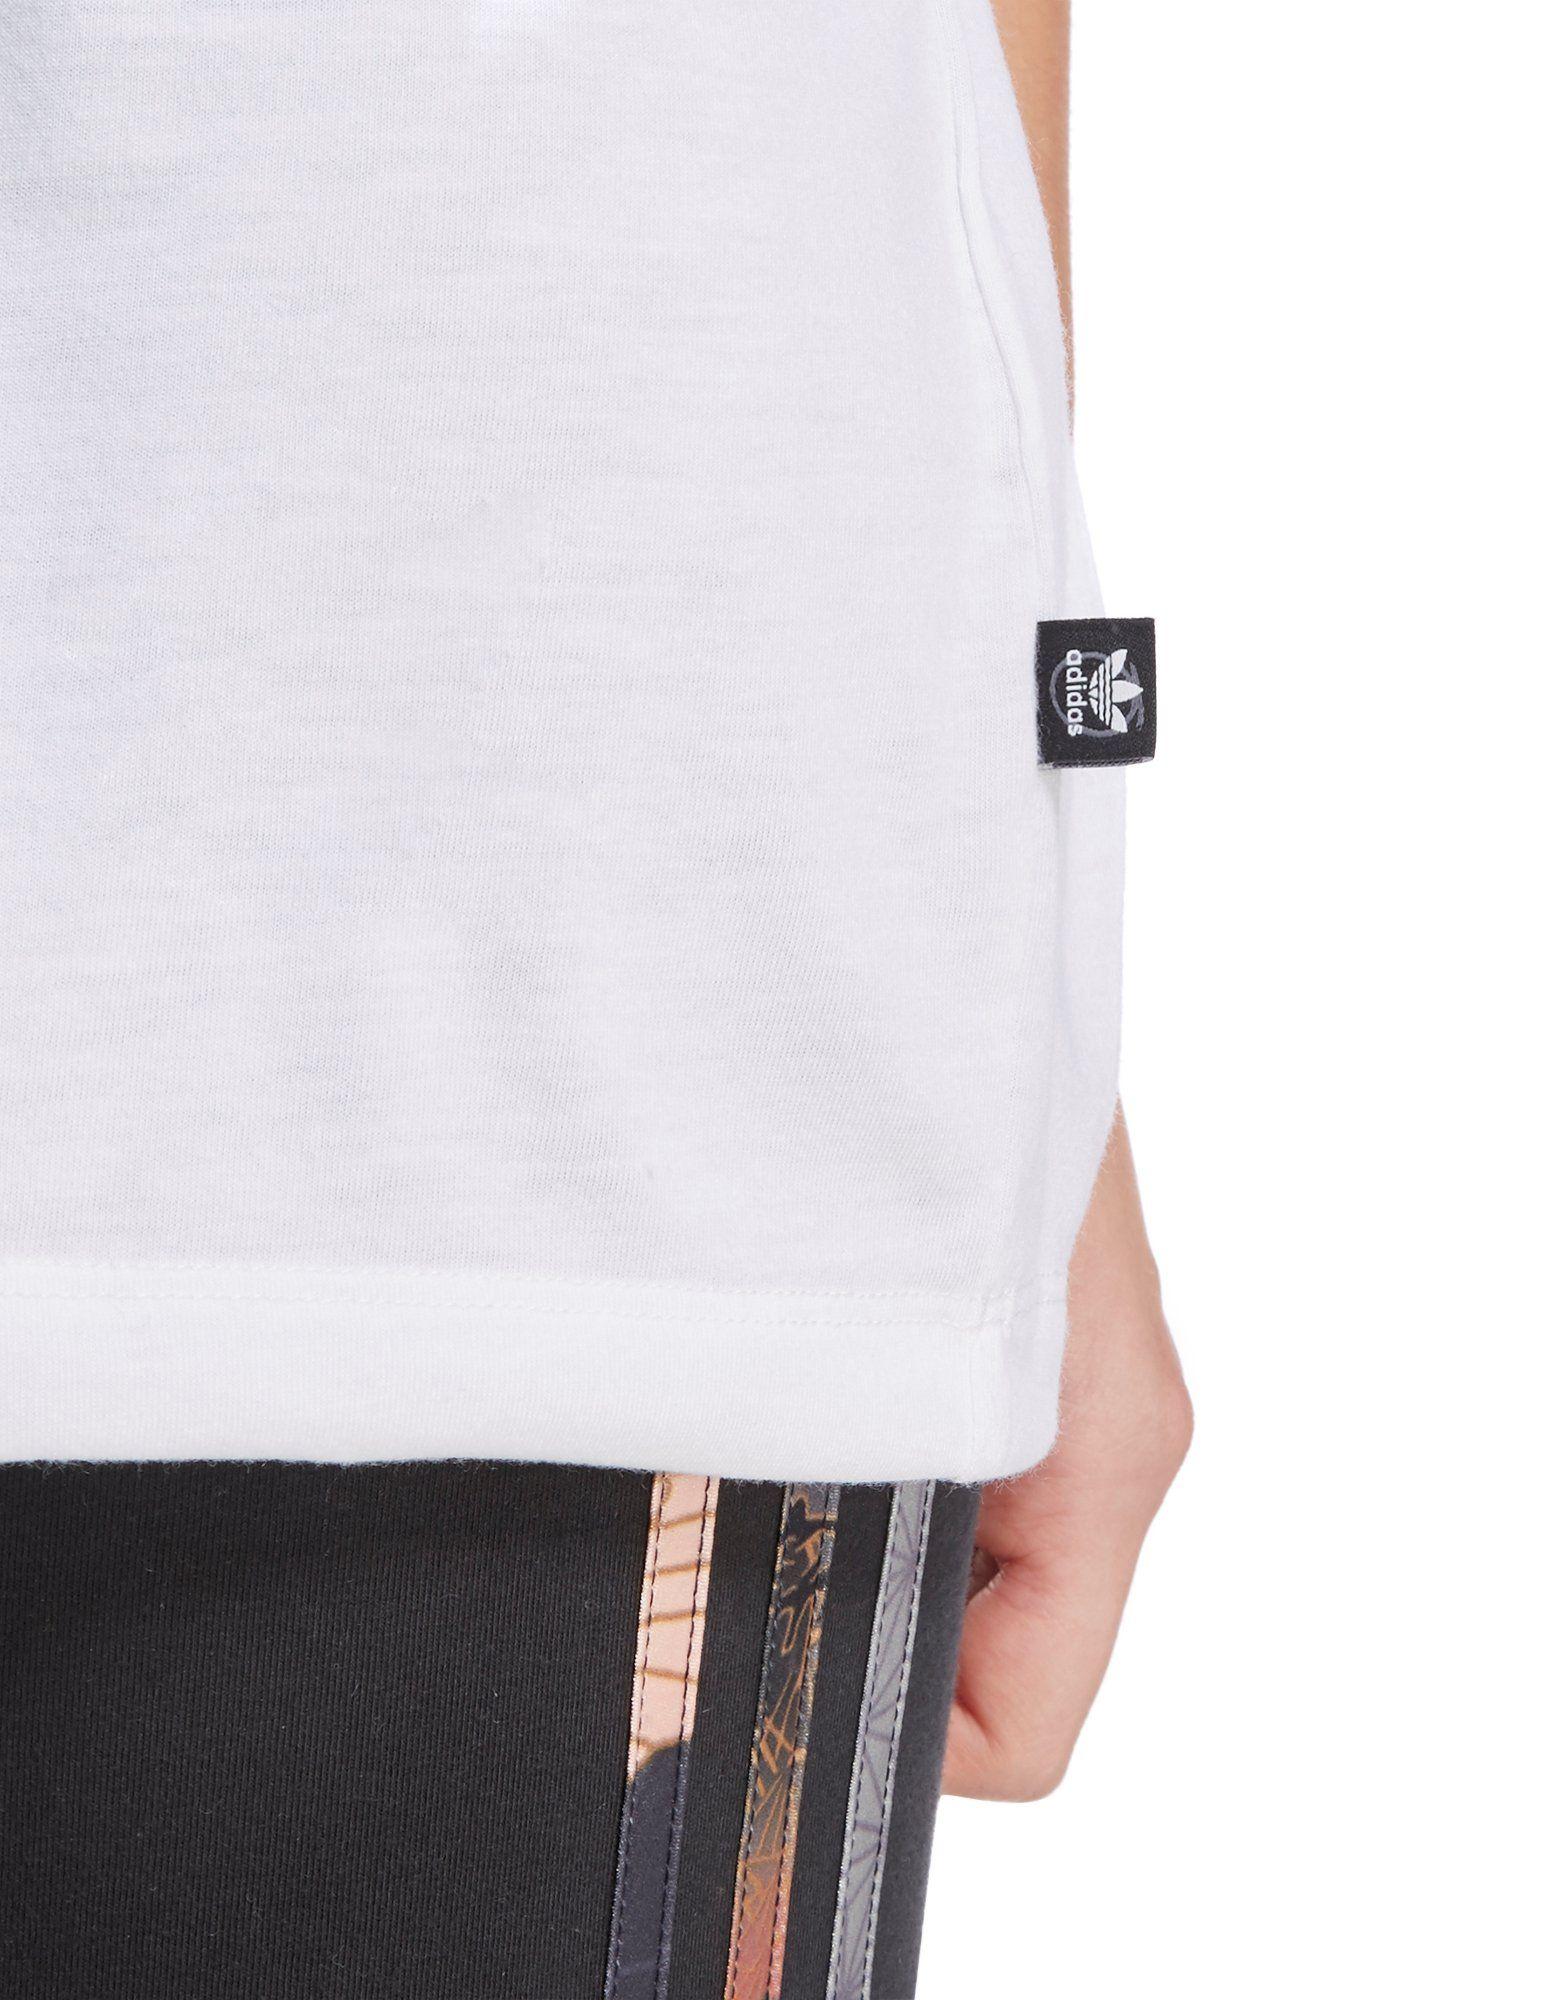 adidas Originals Rita Ora Boyfriend T-Shirt